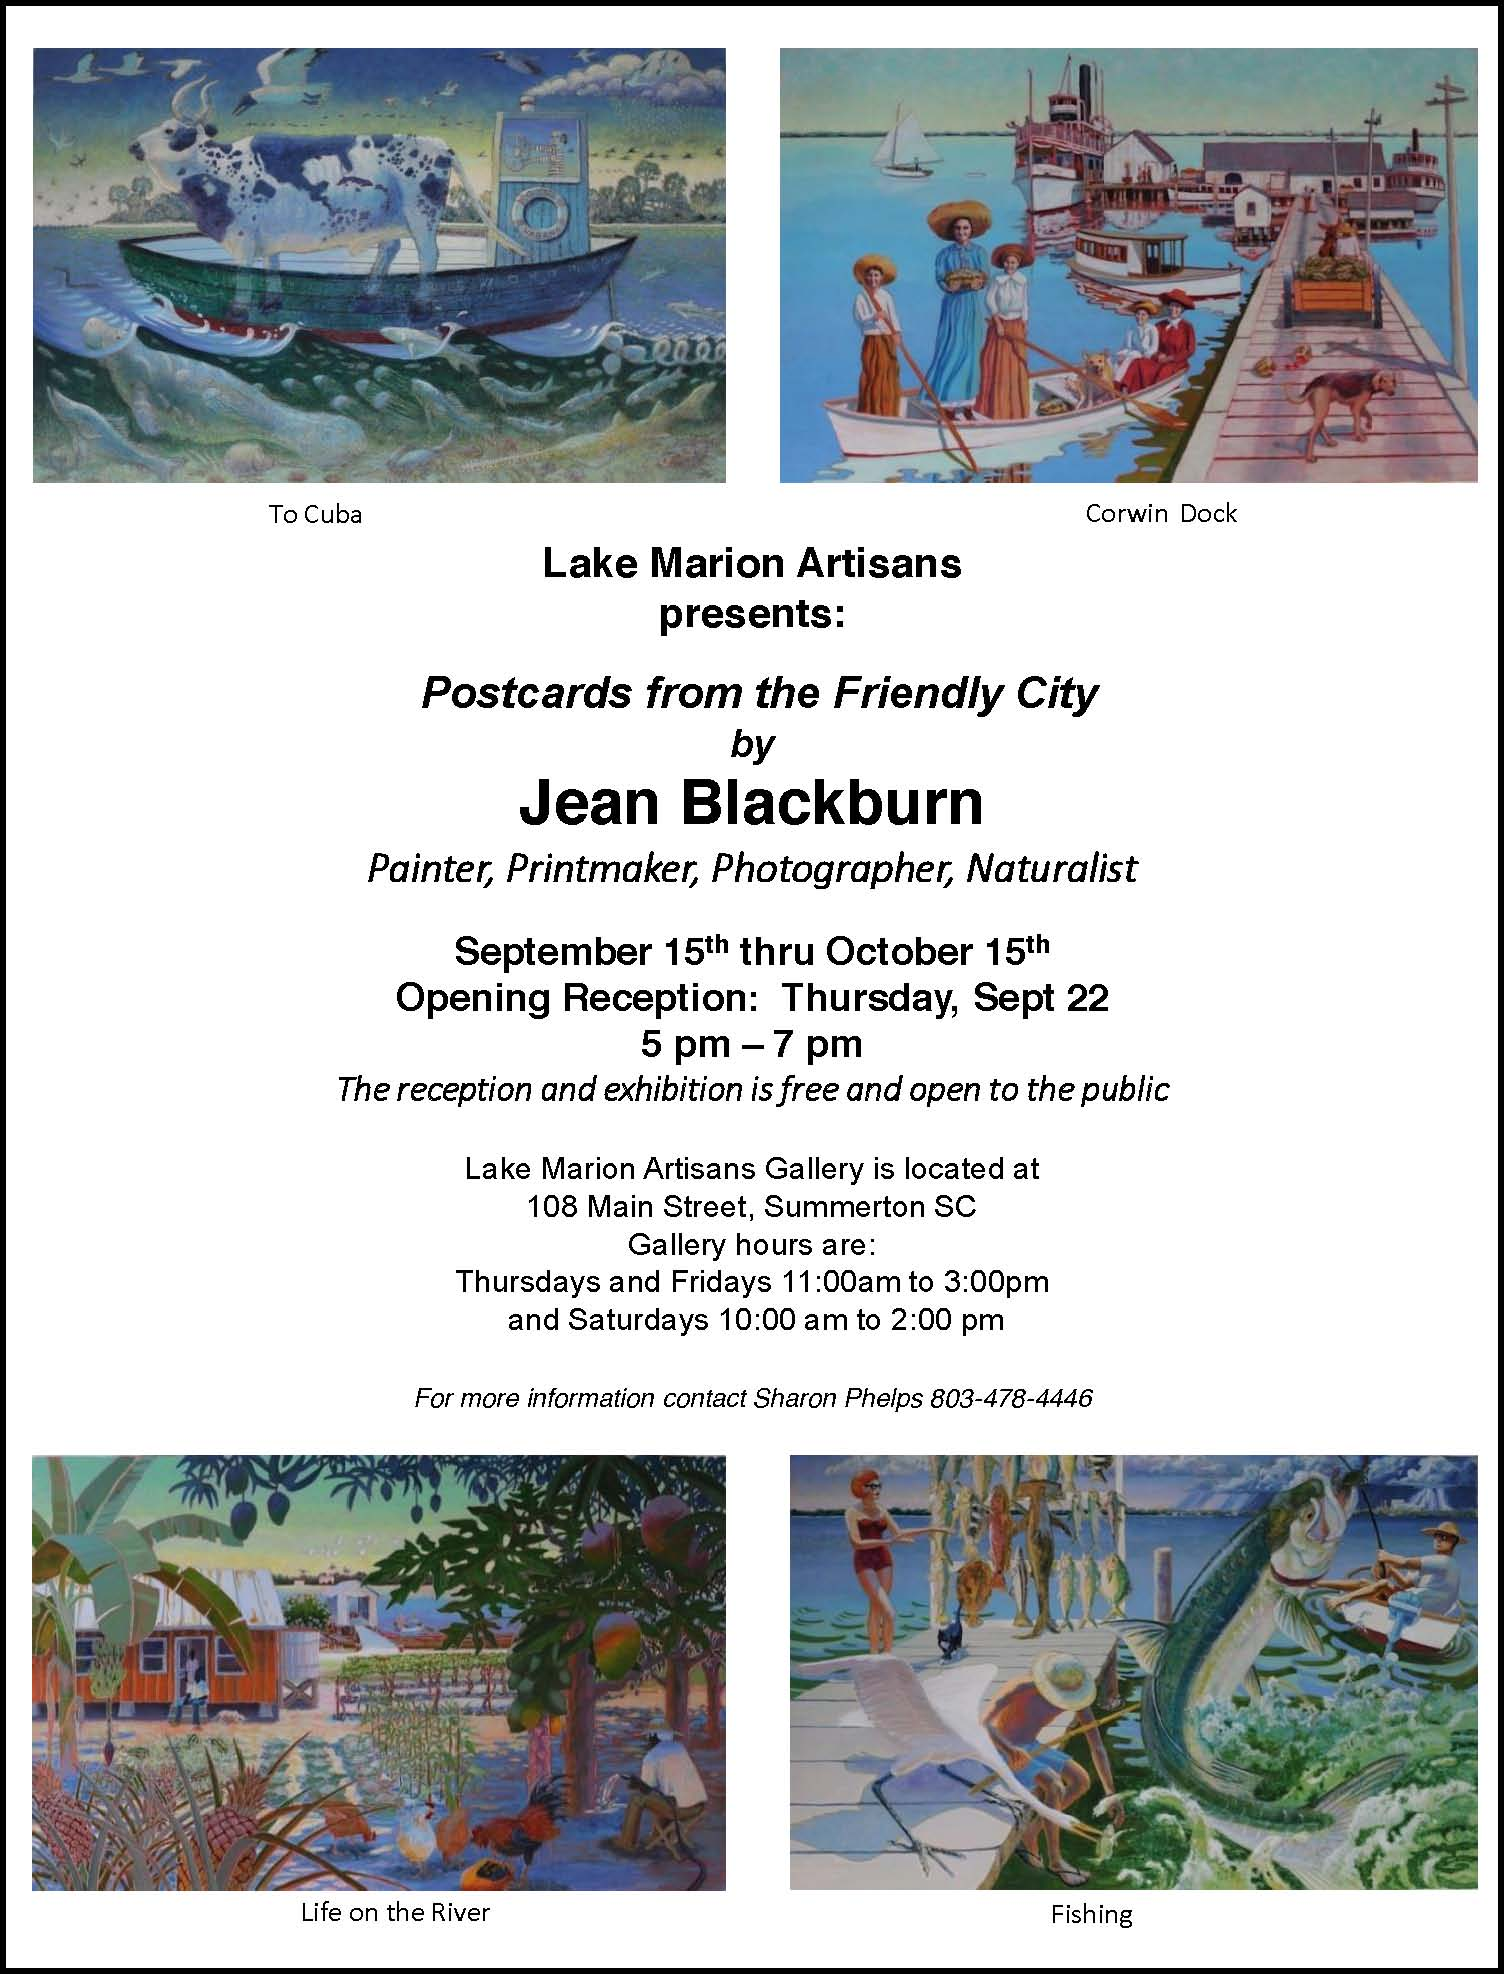 summerton artisans gallery jean blackburn